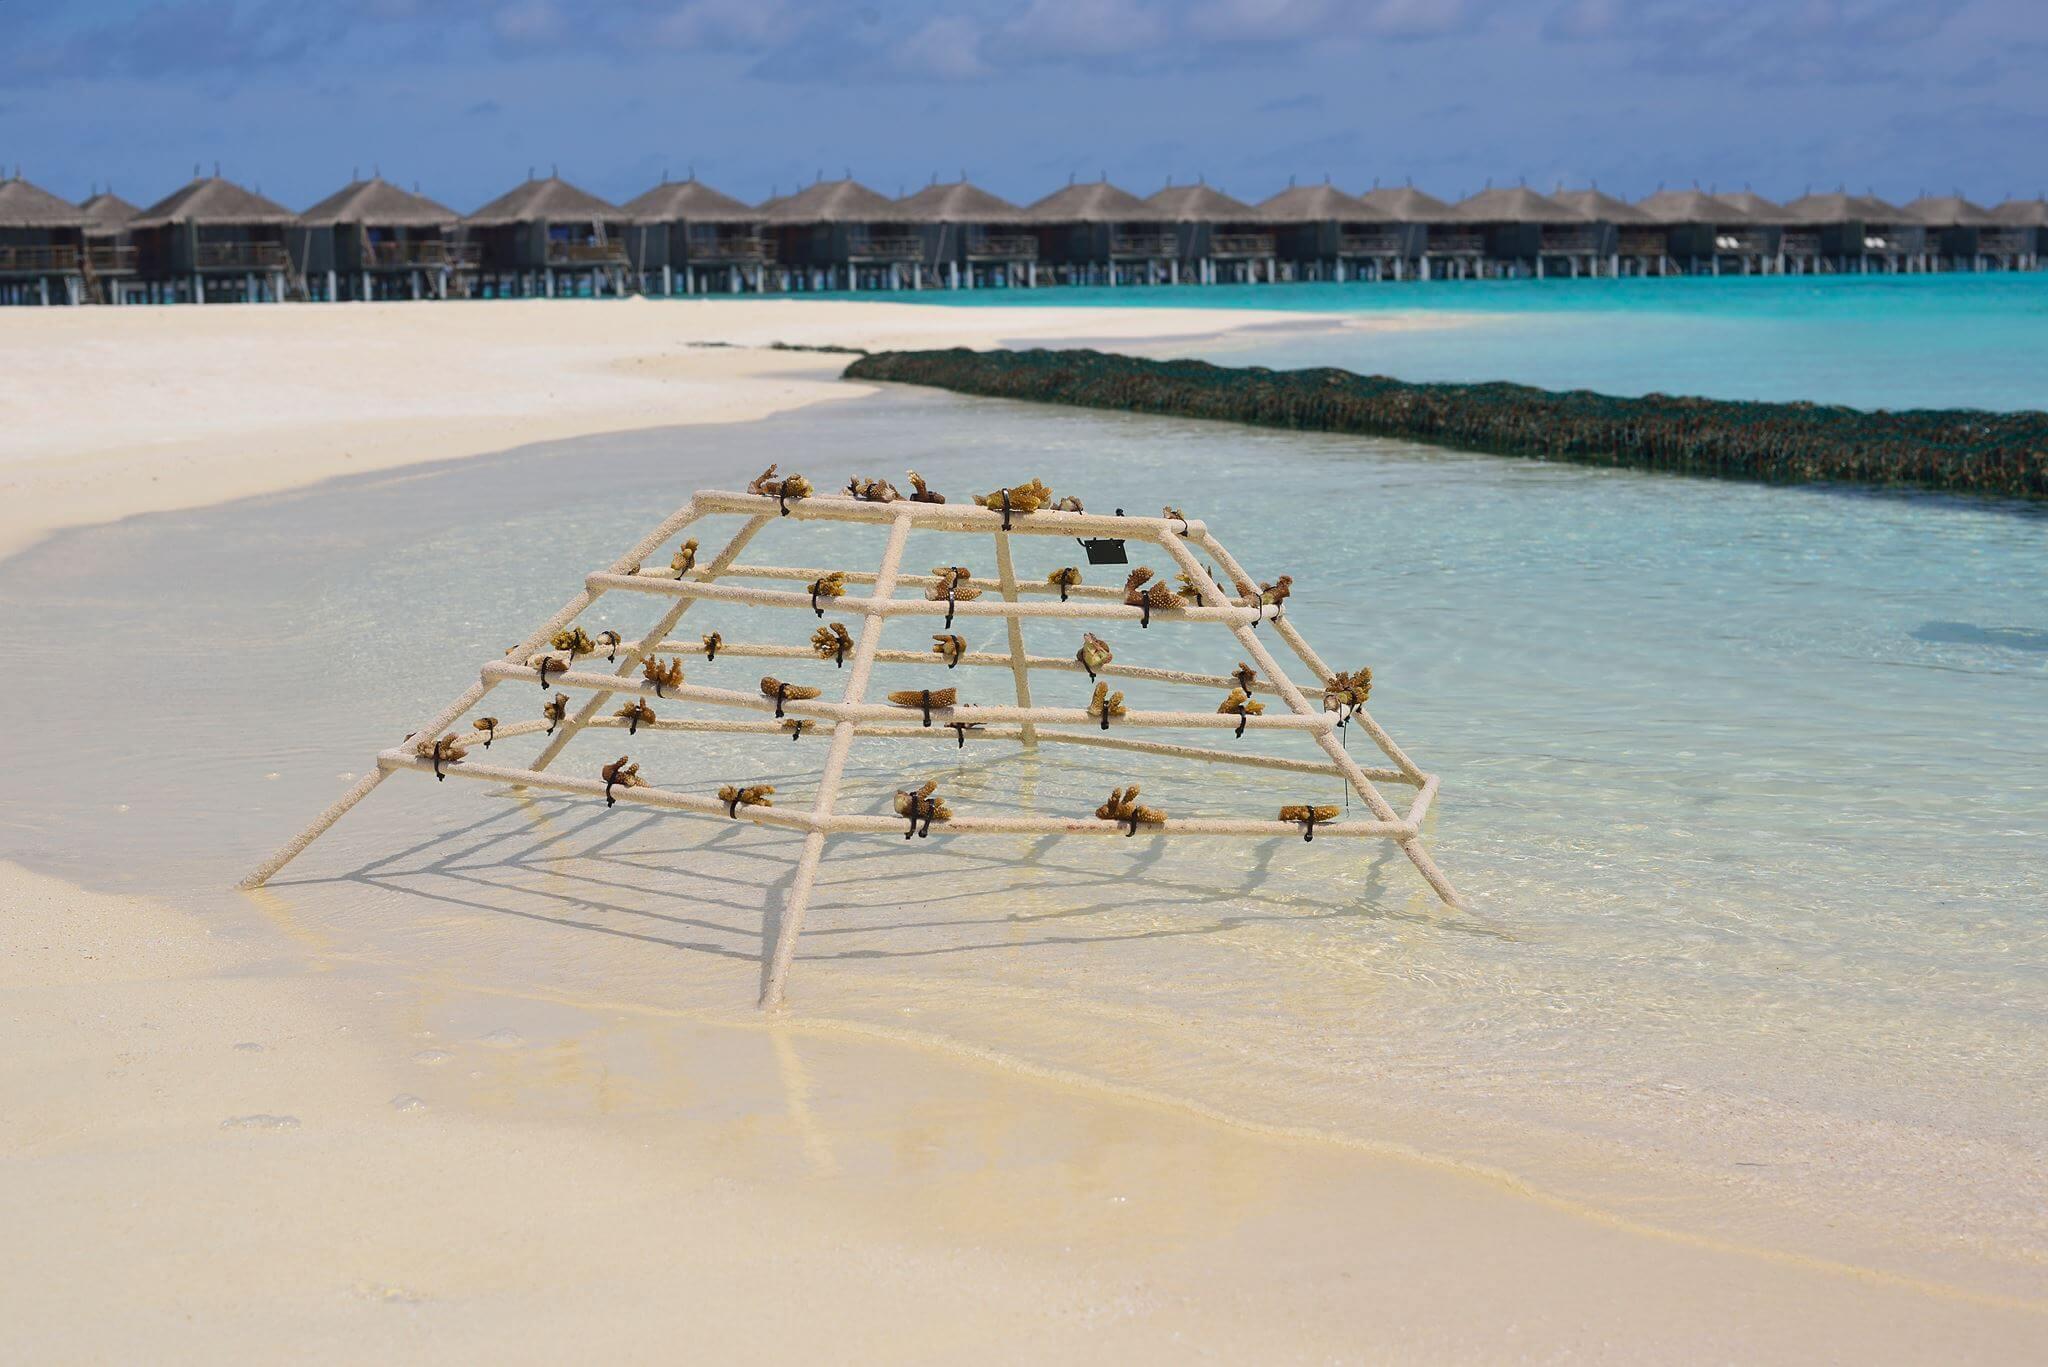 Coral scaper frame at Constance Moofushi Maldives